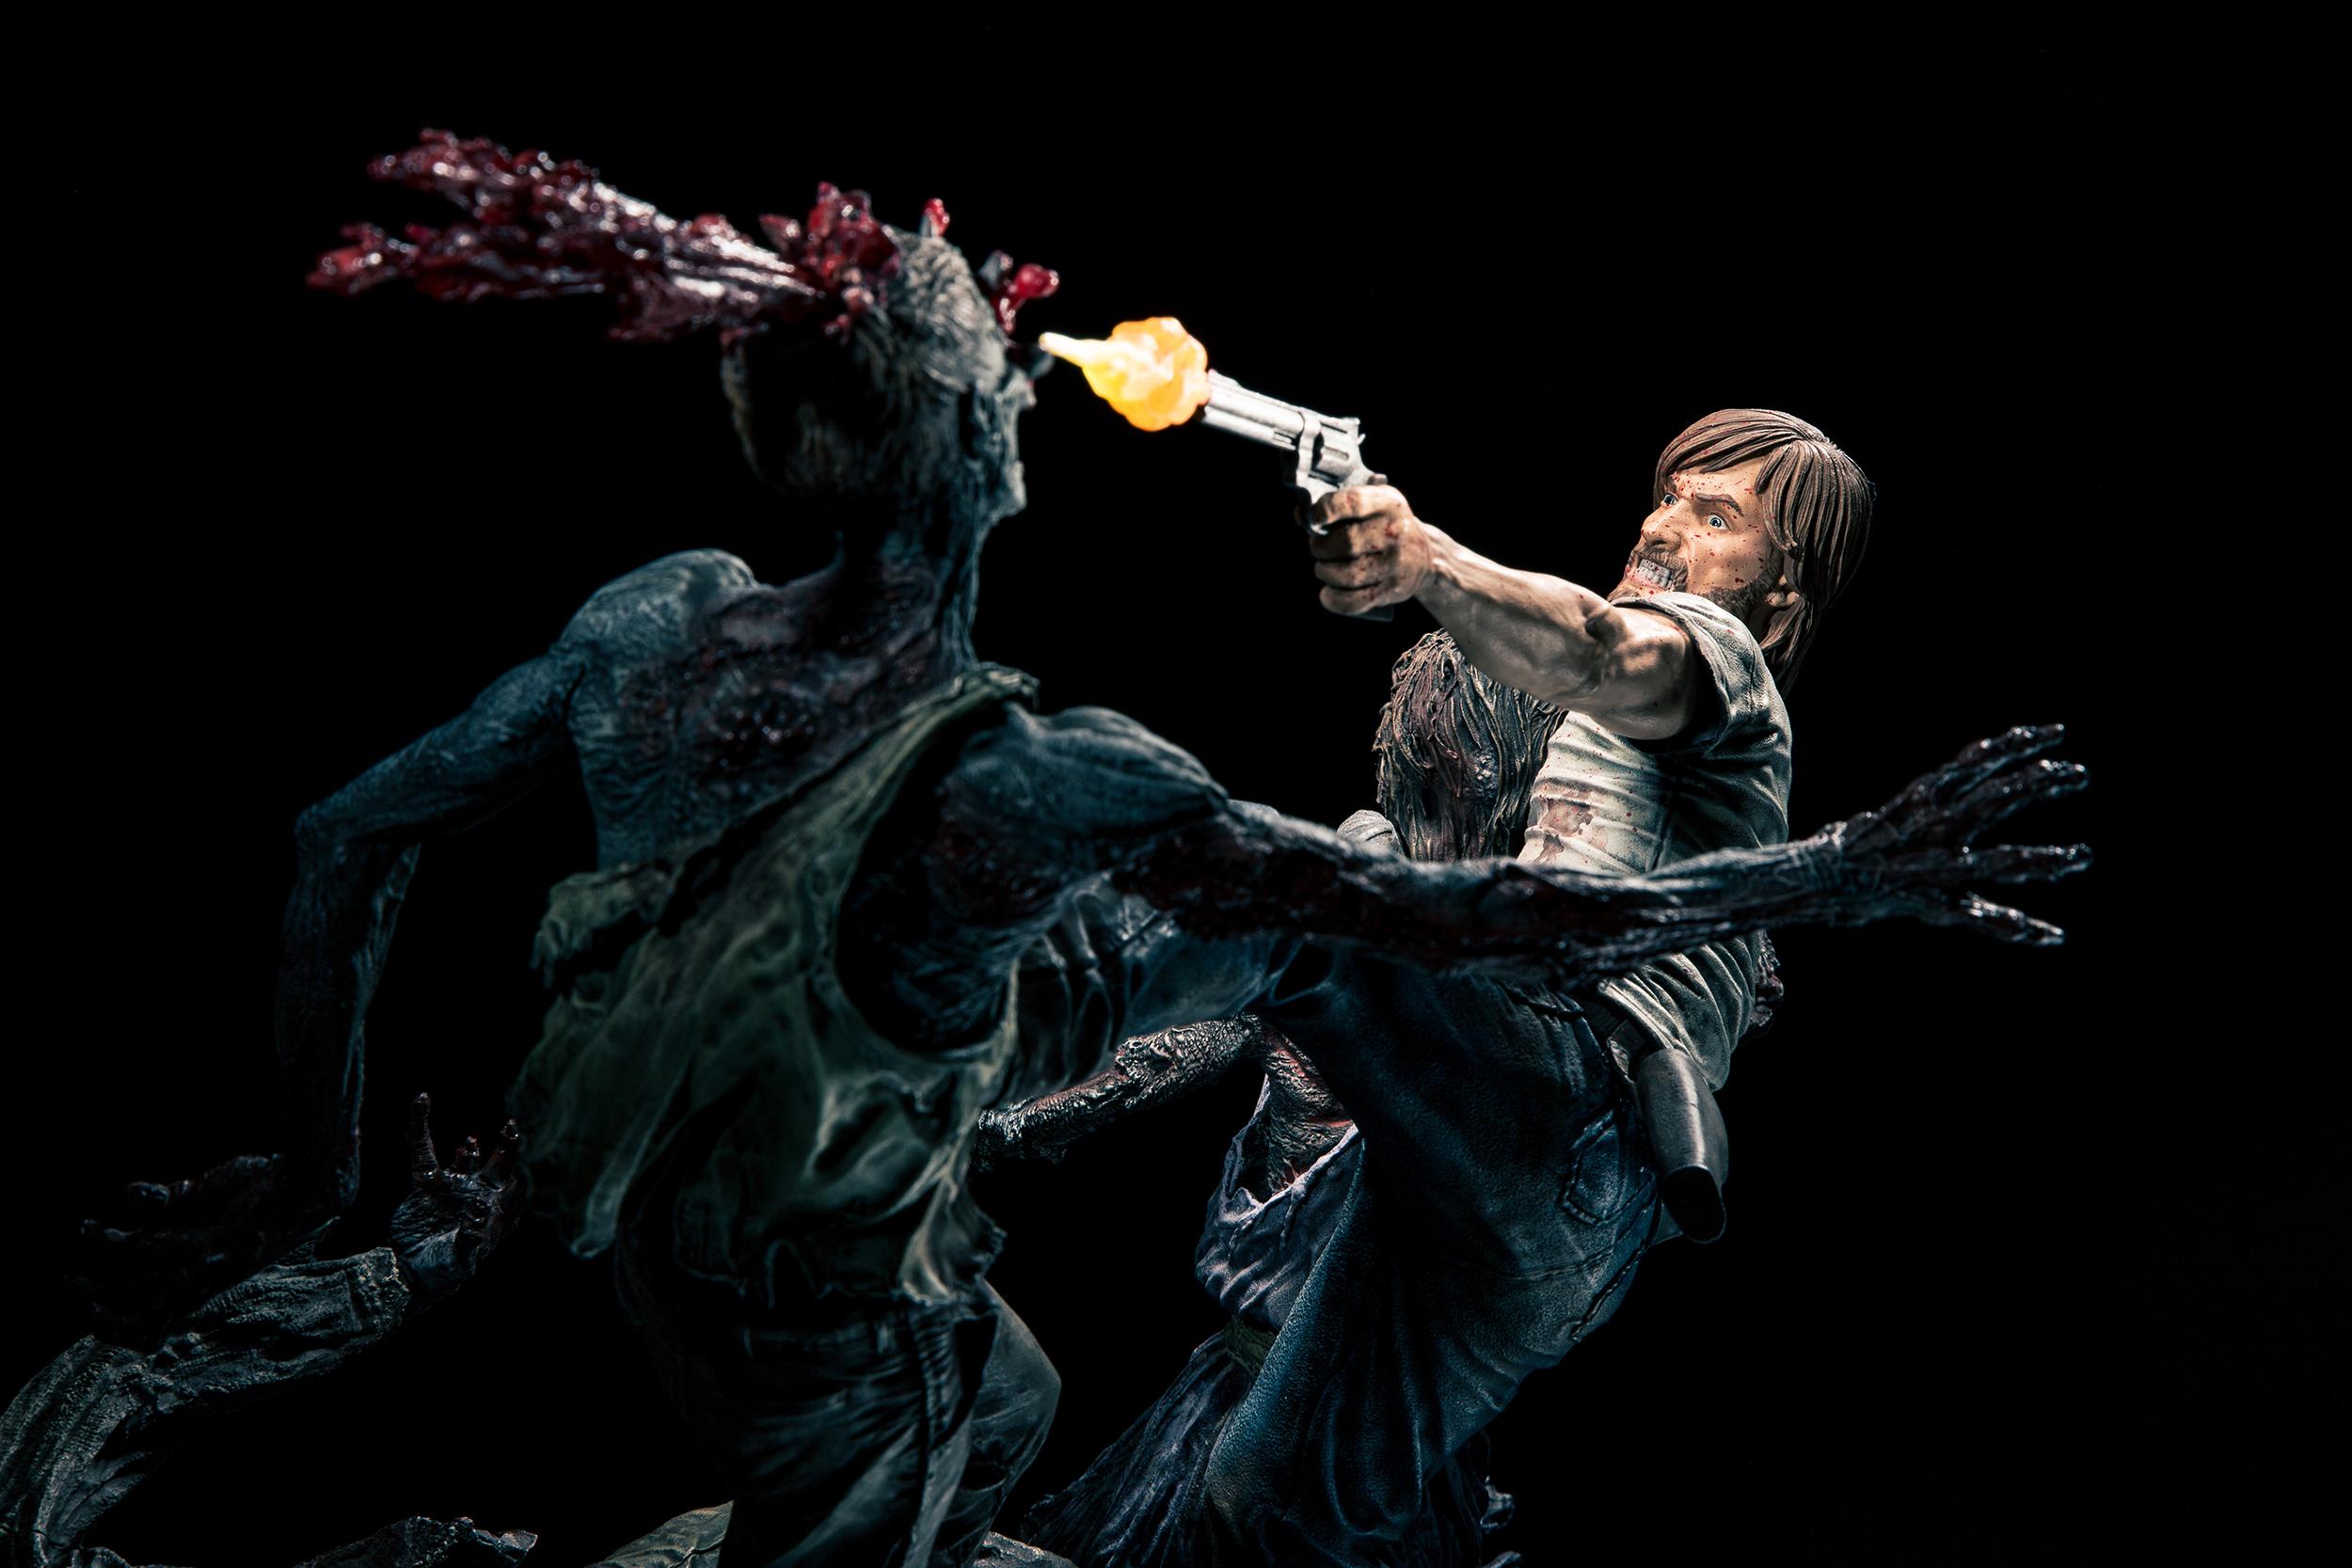 rick-grimes-estatua-mcfarlane-toys-006